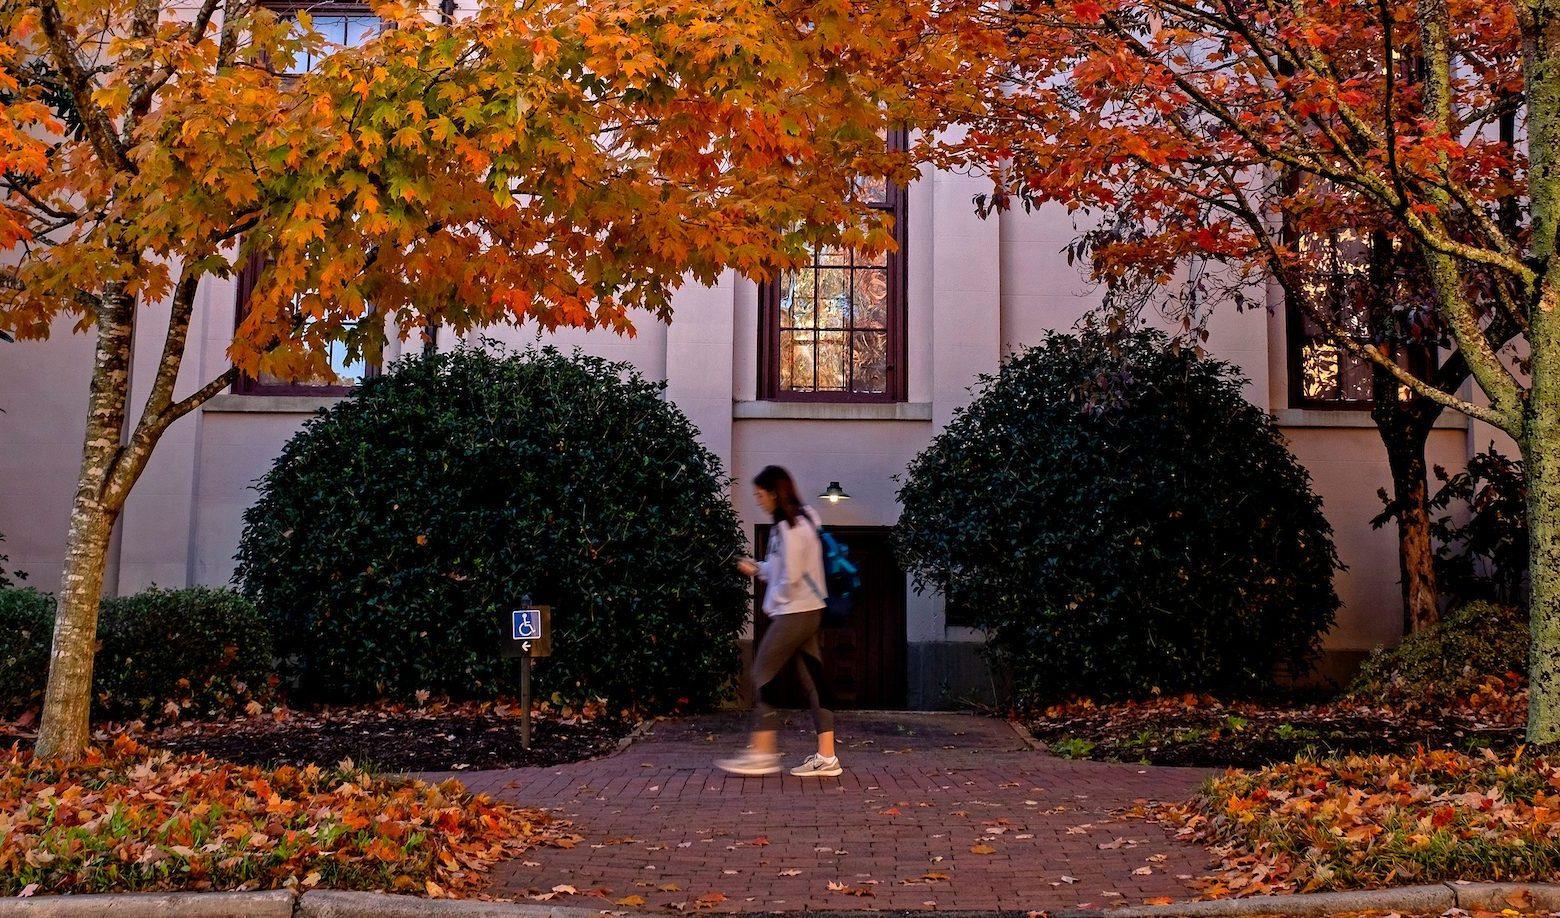 Campus fall scene